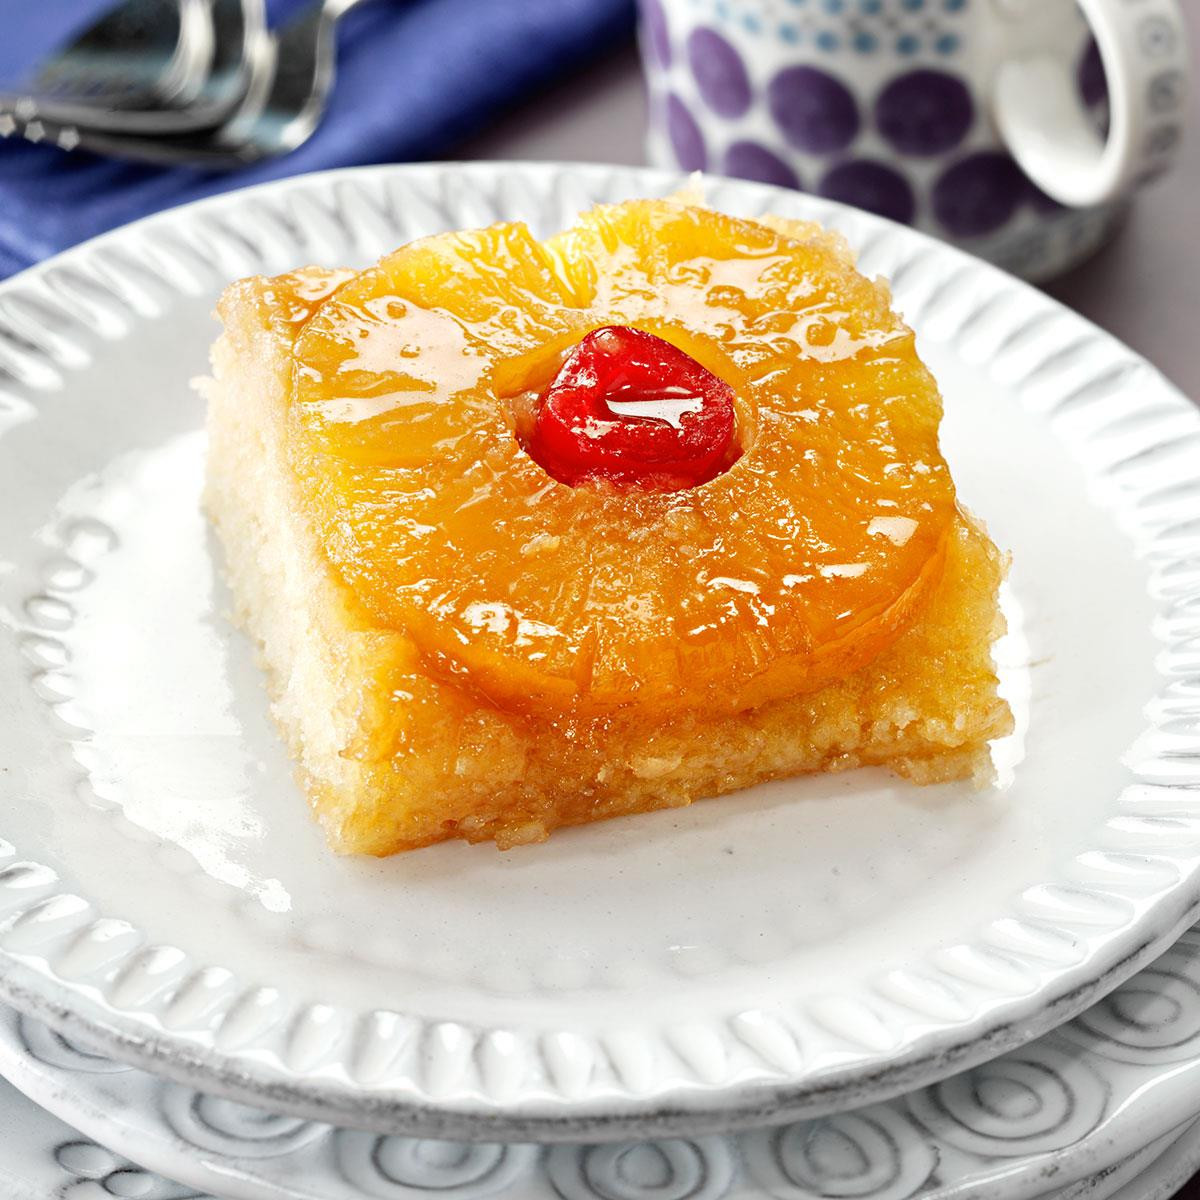 Pineapple Upside Down Cake Recipe  Makeover Pineapple Upside Down Cake Recipe